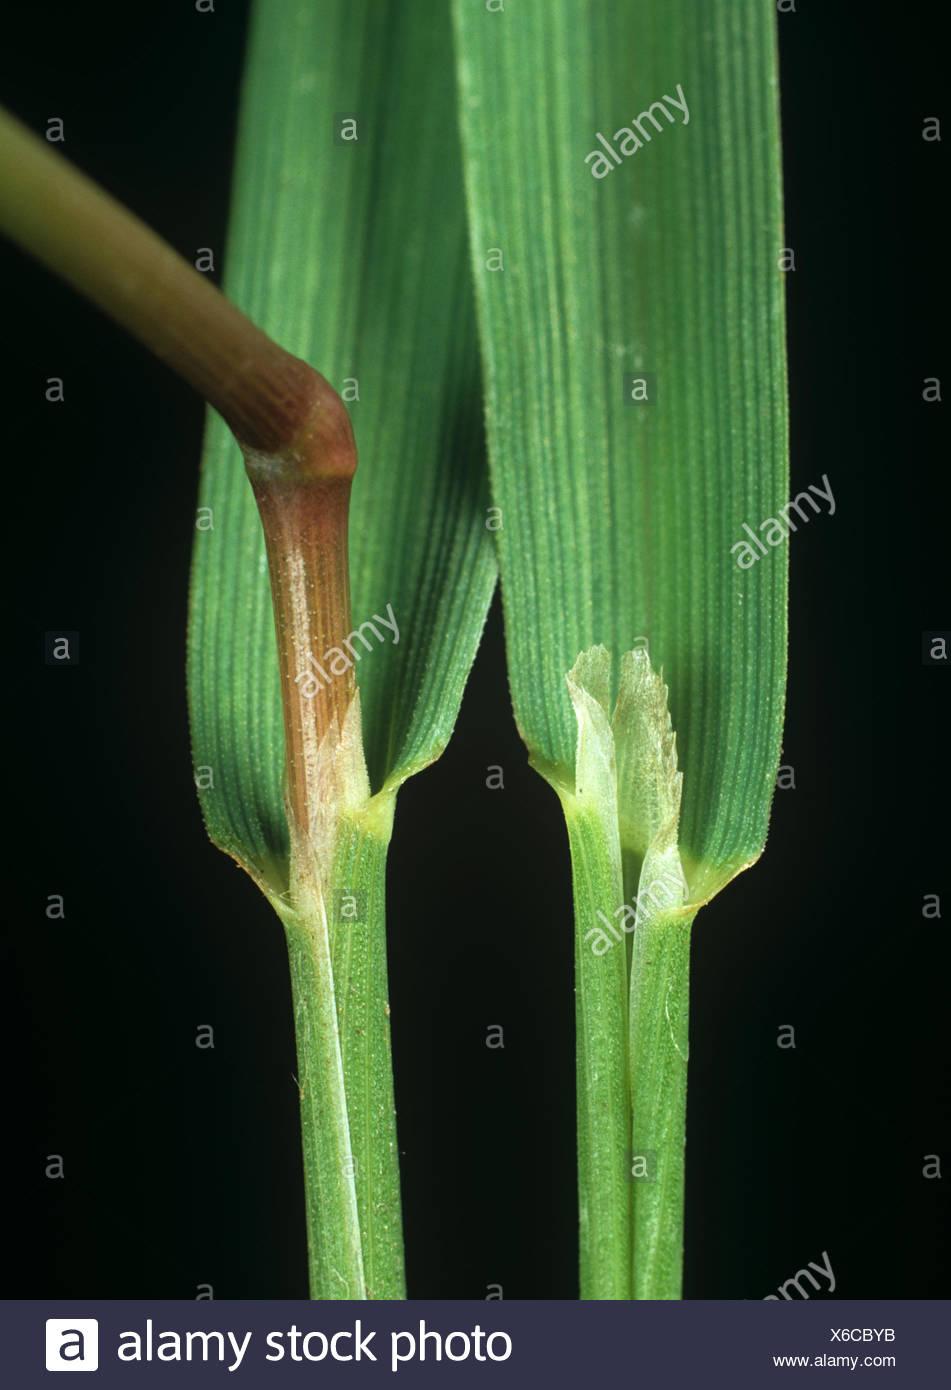 Dobladas o negro redtop, Agrostis gigantea, hoja ligule al nodo y leafstalk de gramíneas agrícola Imagen De Stock